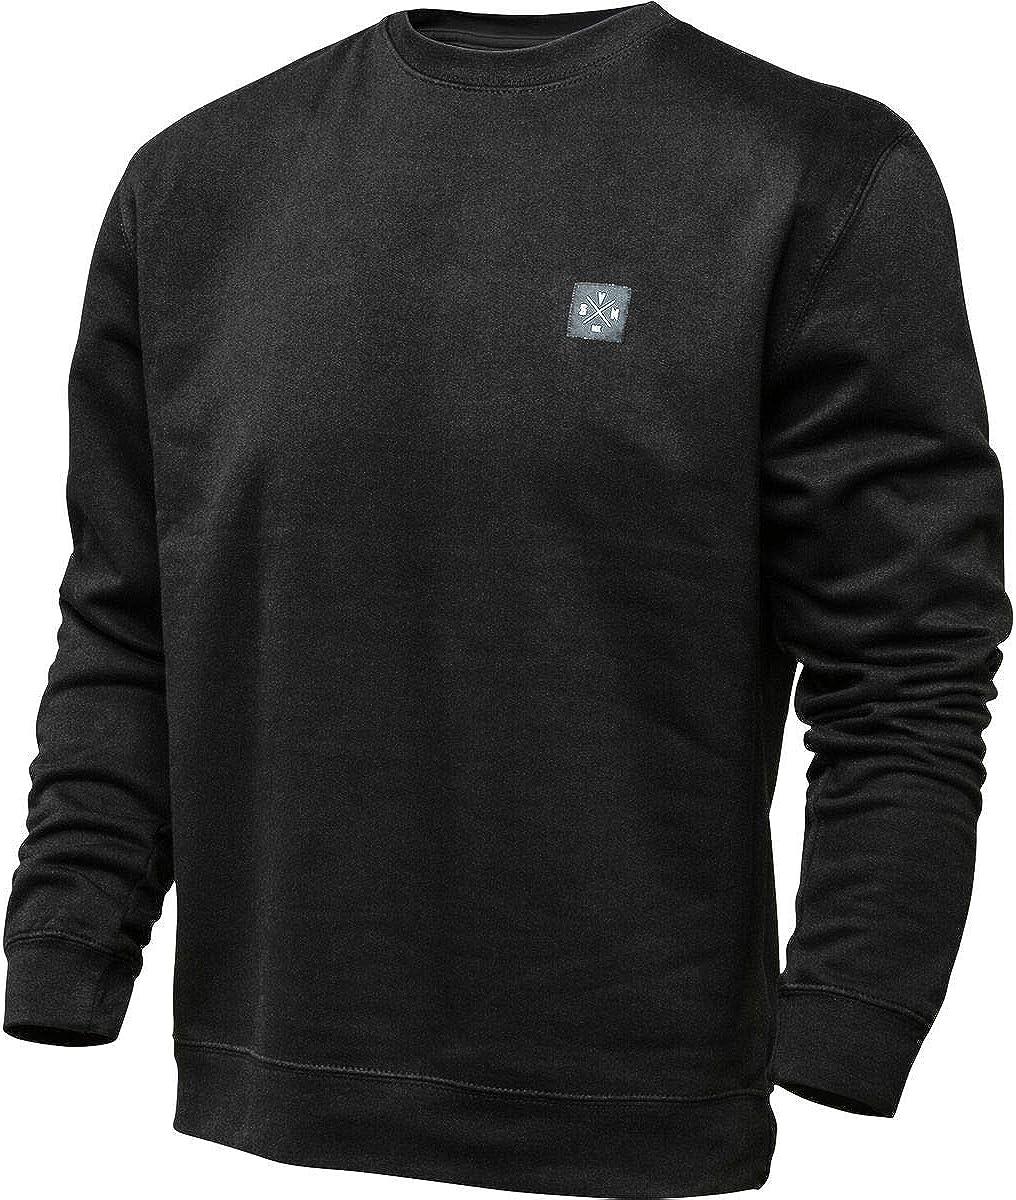 Seven Benchmark Crew Sweatshirt